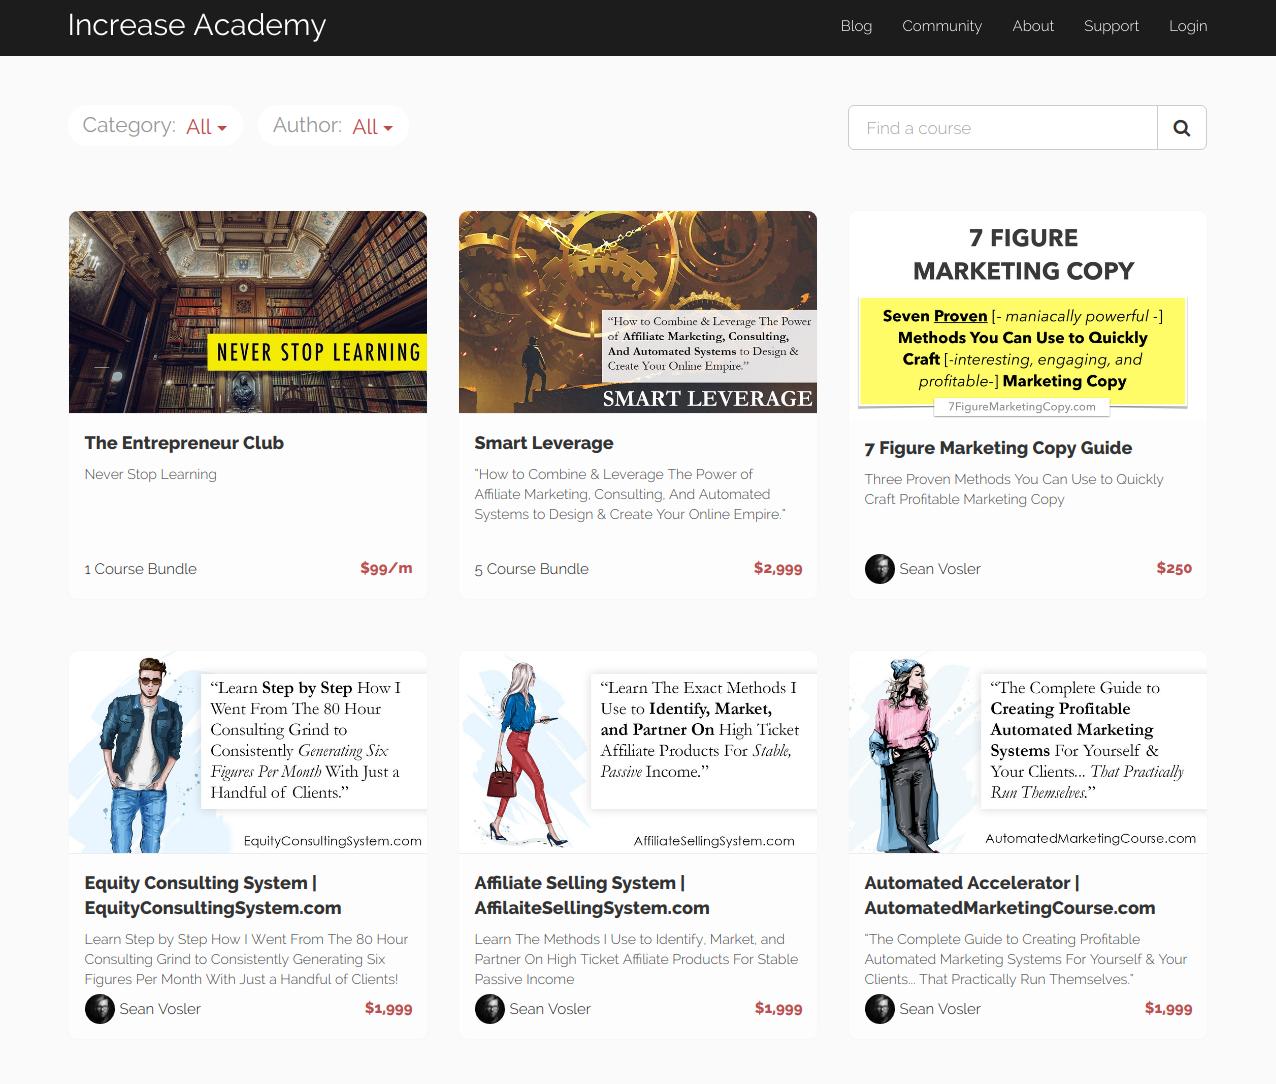 sean vosler increase academy Online Digital Marketing Course